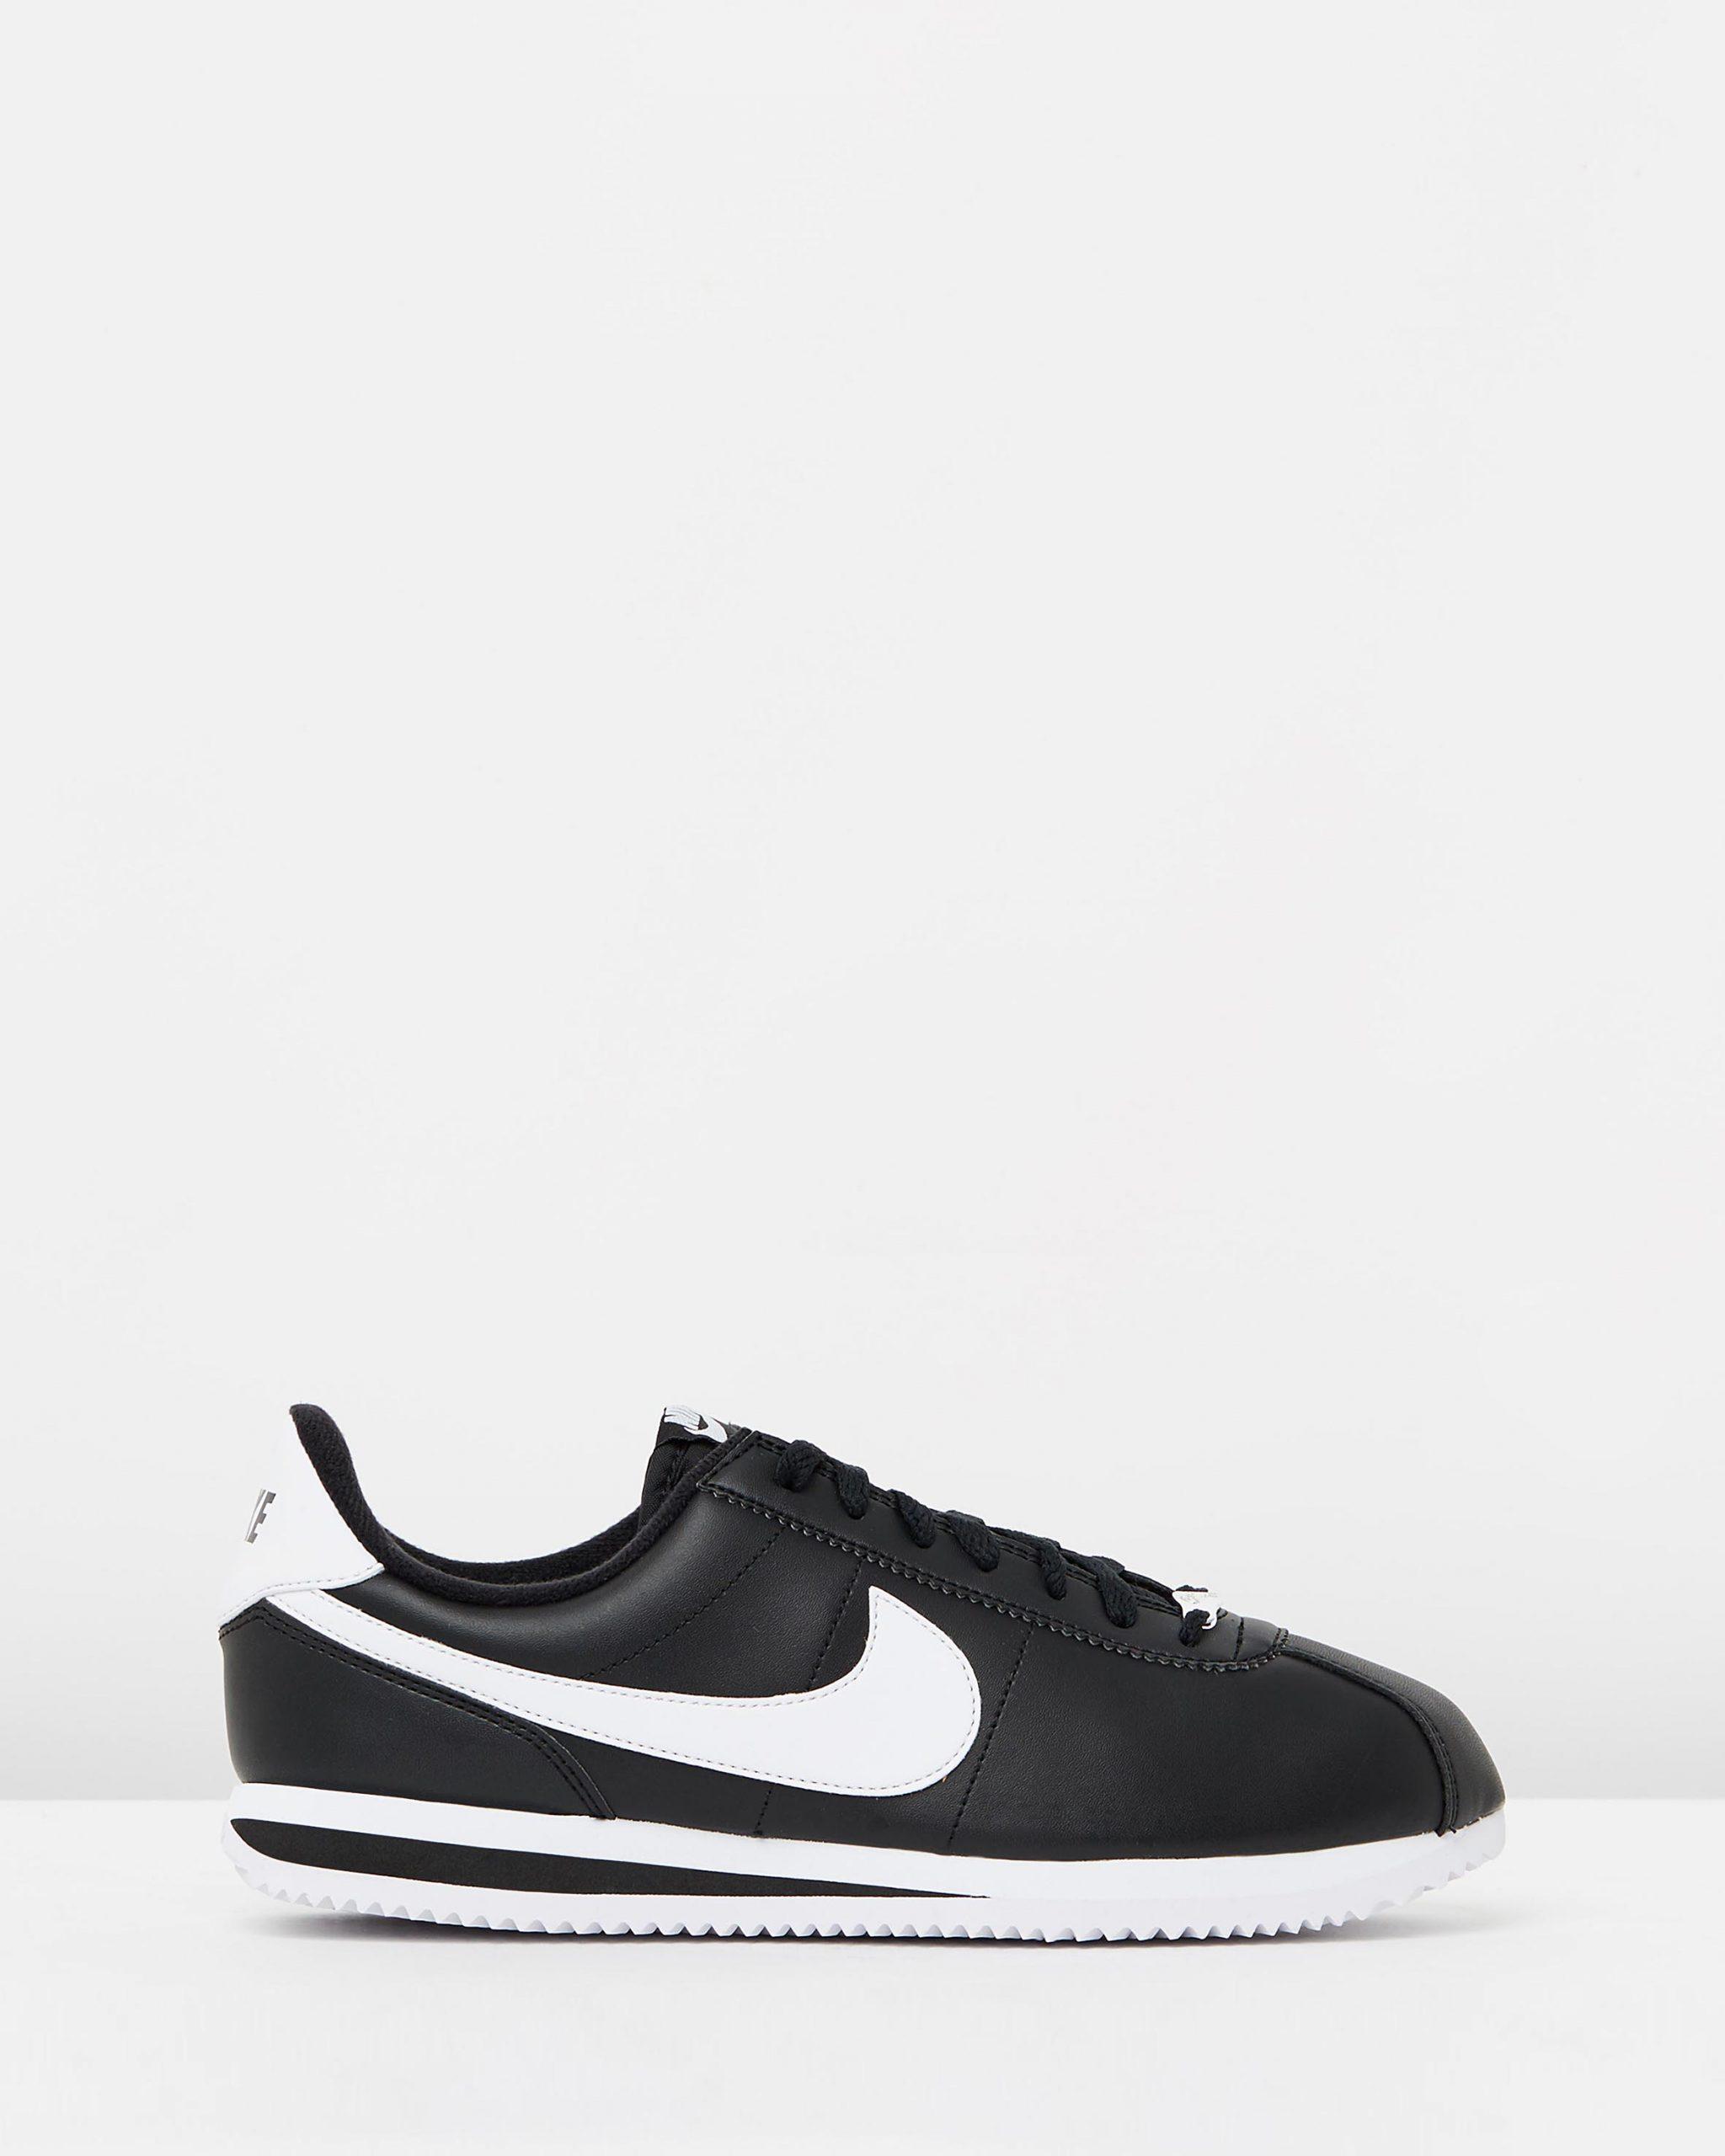 La risa Incienso dolor de muelas  Nike Cortez Basic Leather Black & White - 95Gallery.com